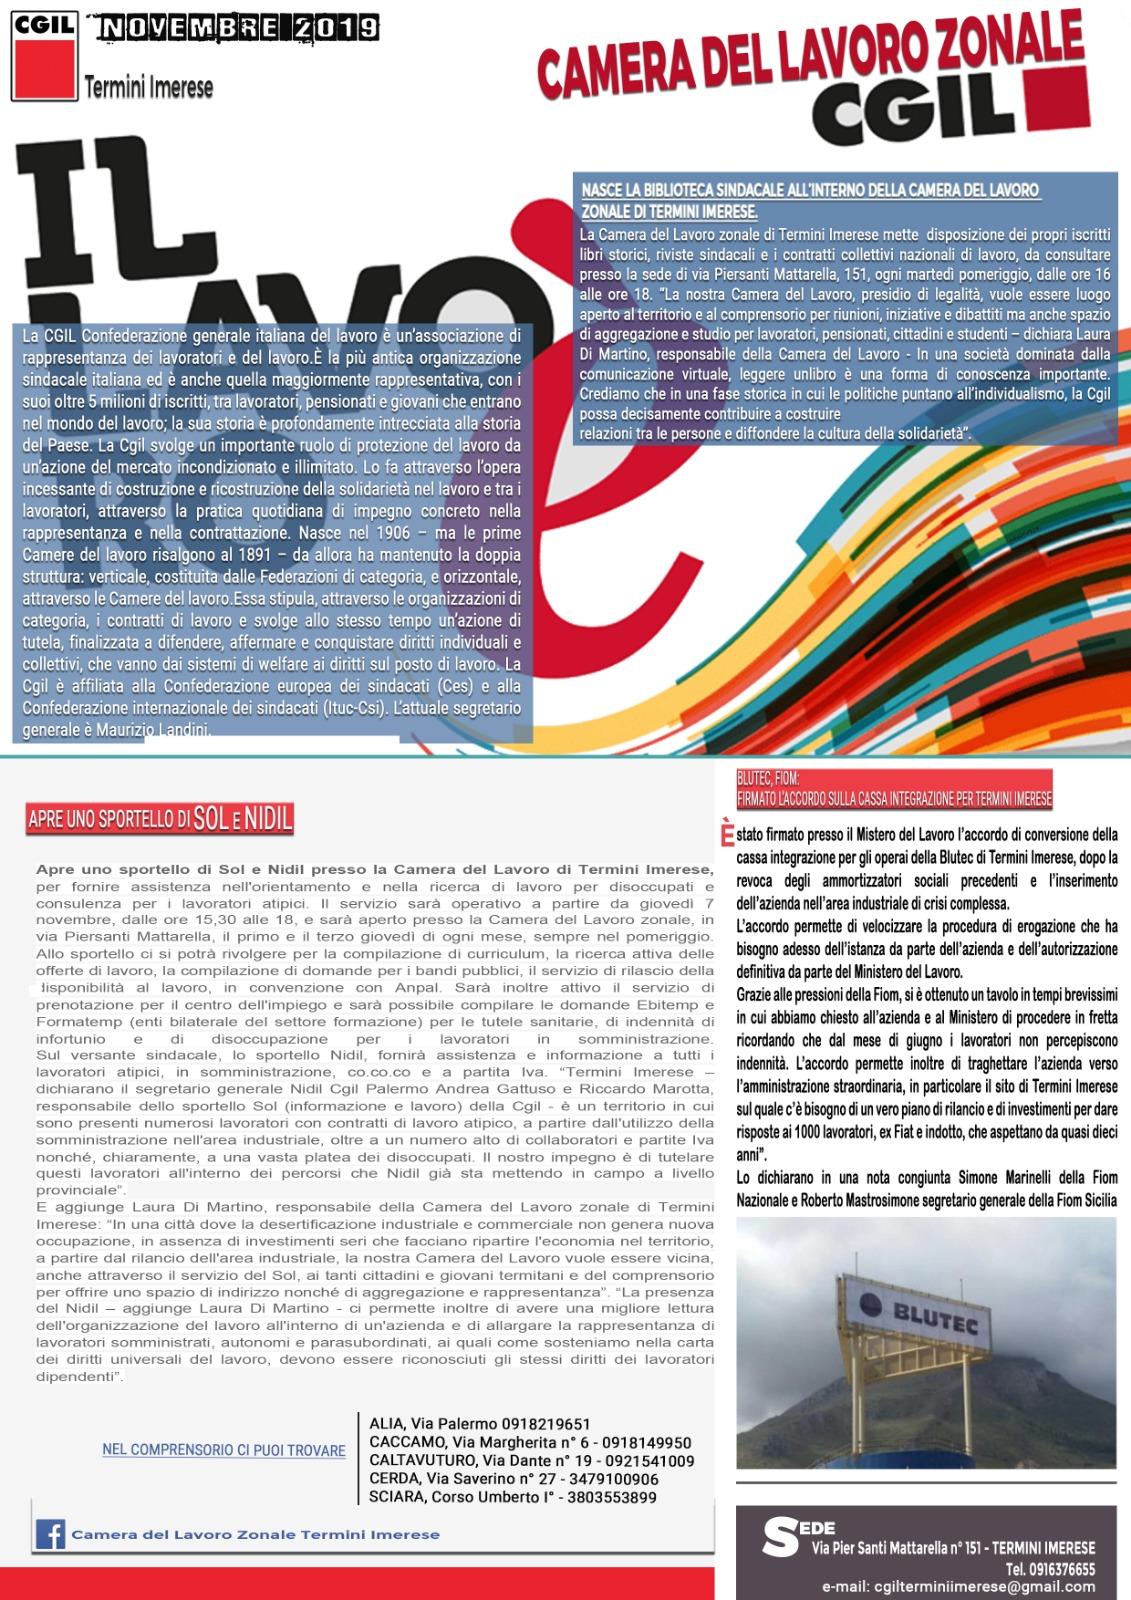 giornalino-termini-imerese